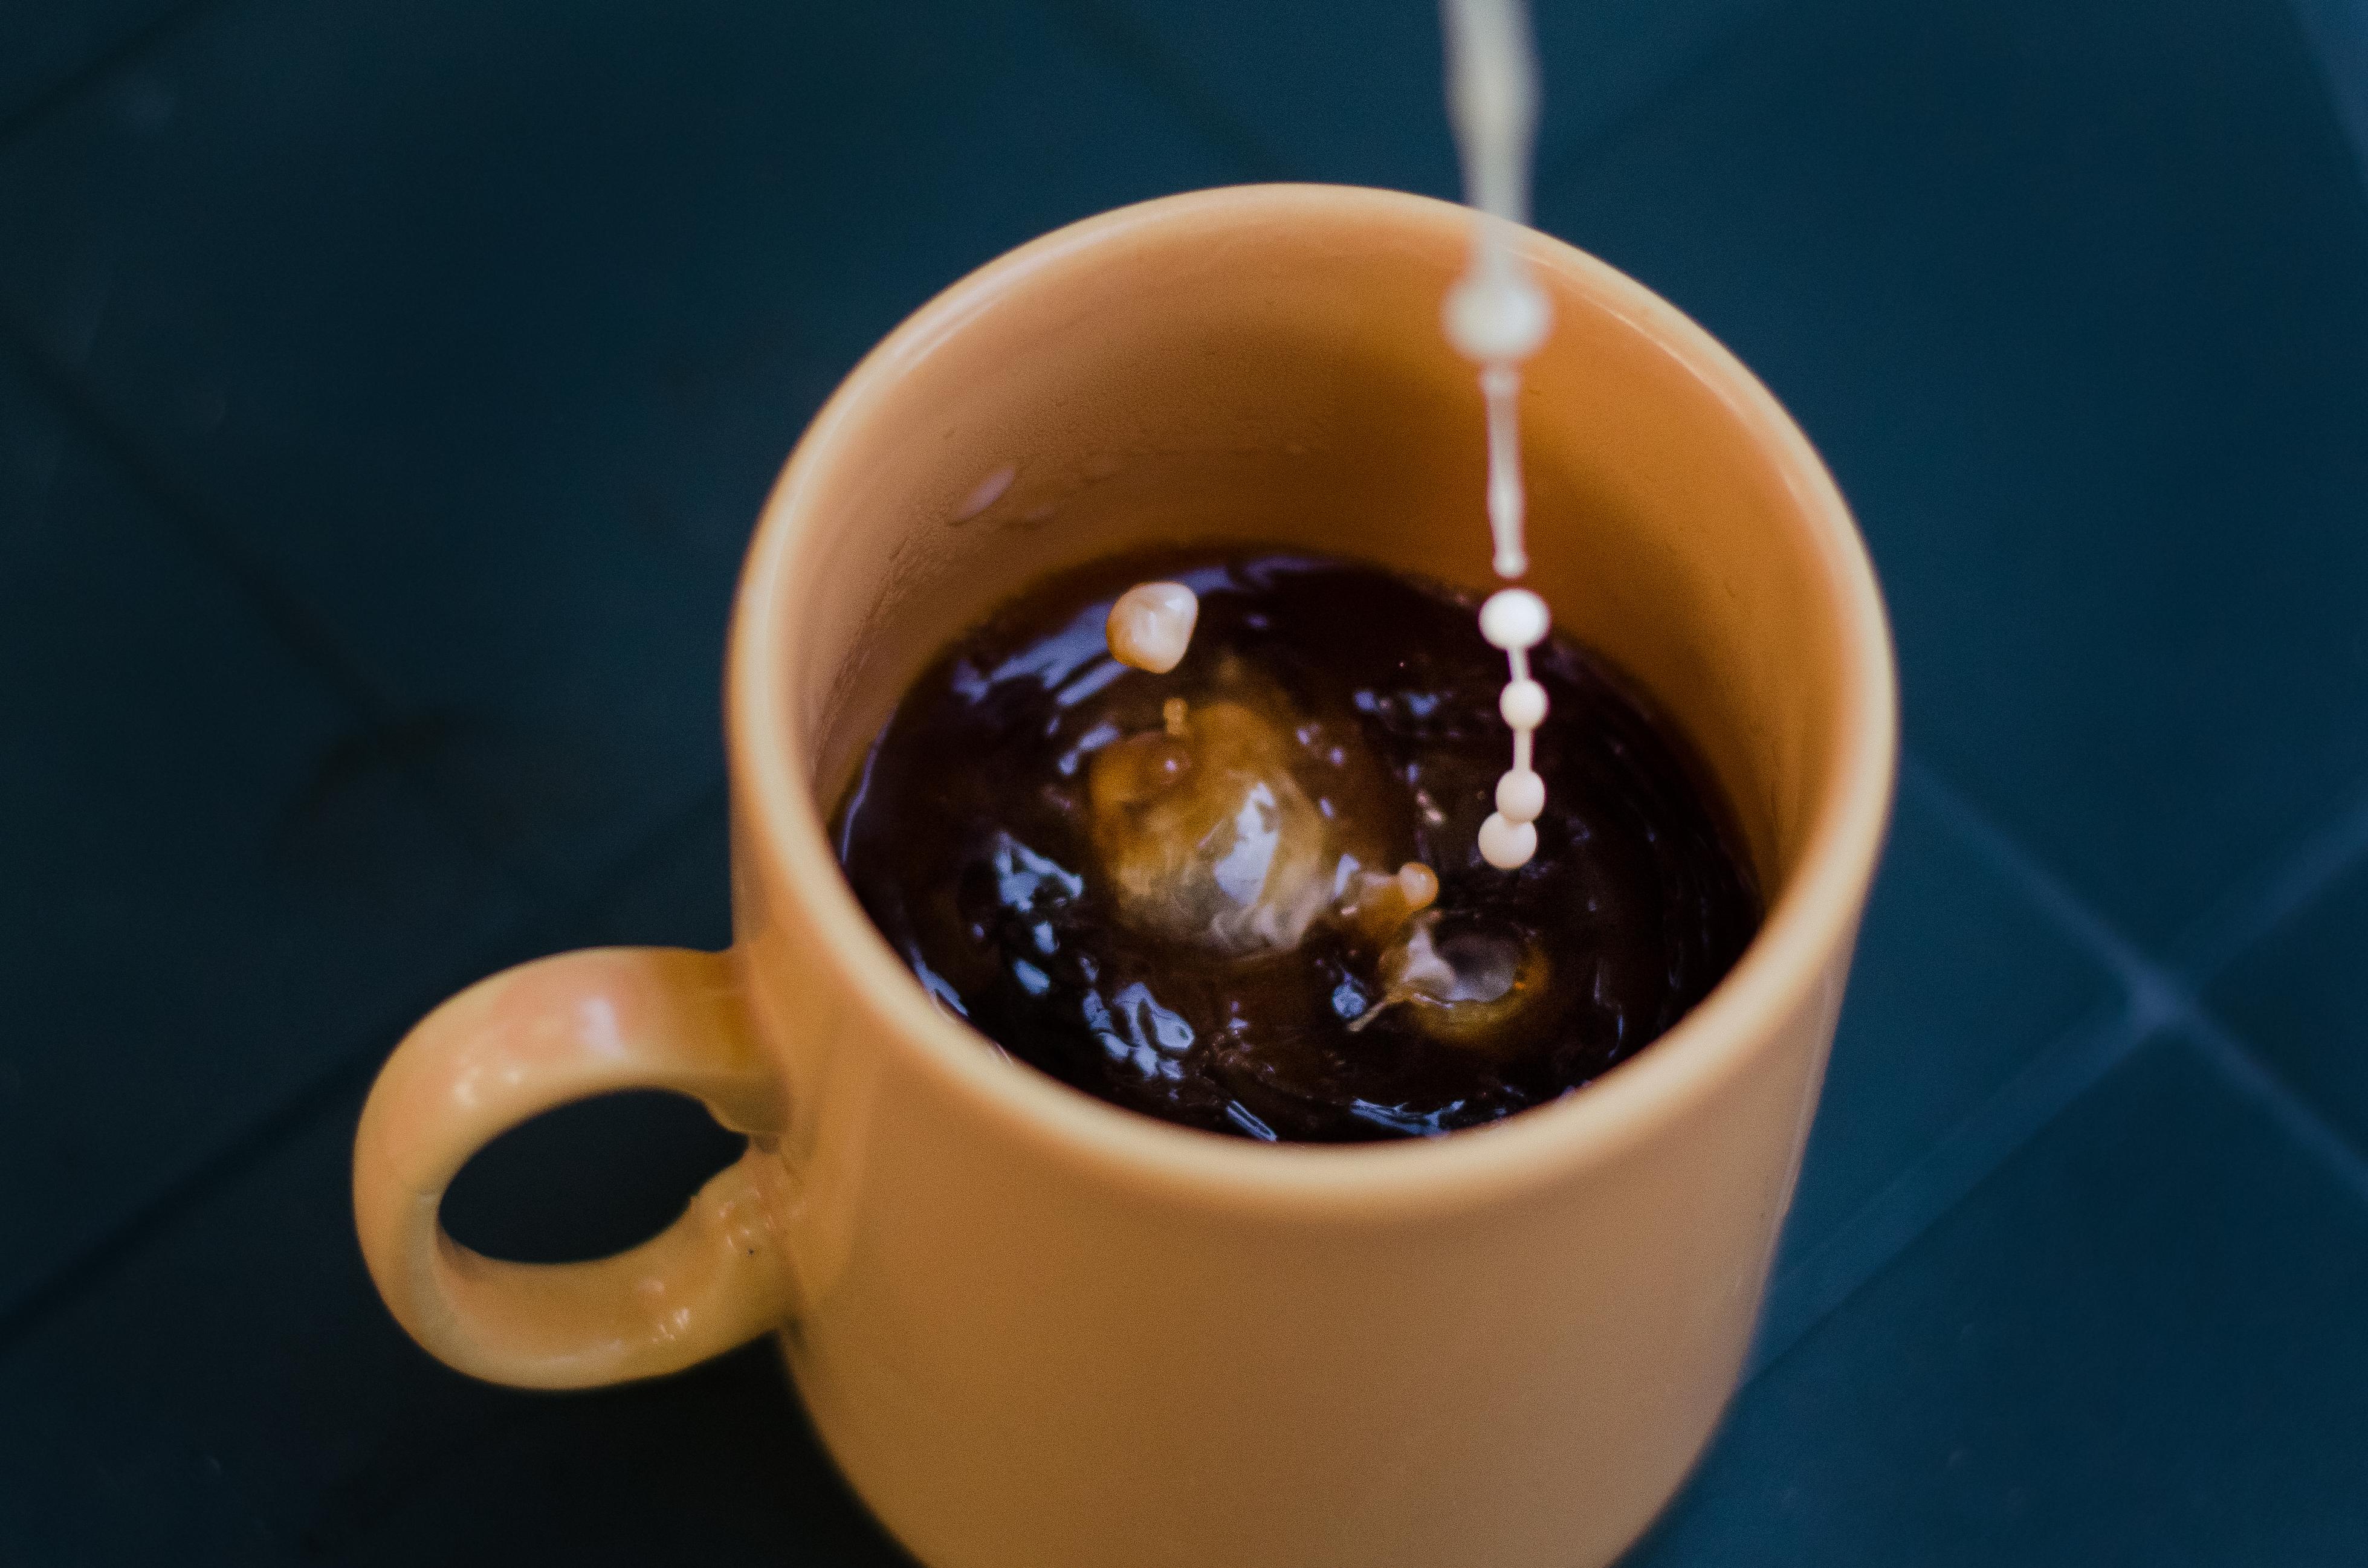 Liquid · Black Filled Brown Free Ceramic Mug Stock Photo 1lFKJTc